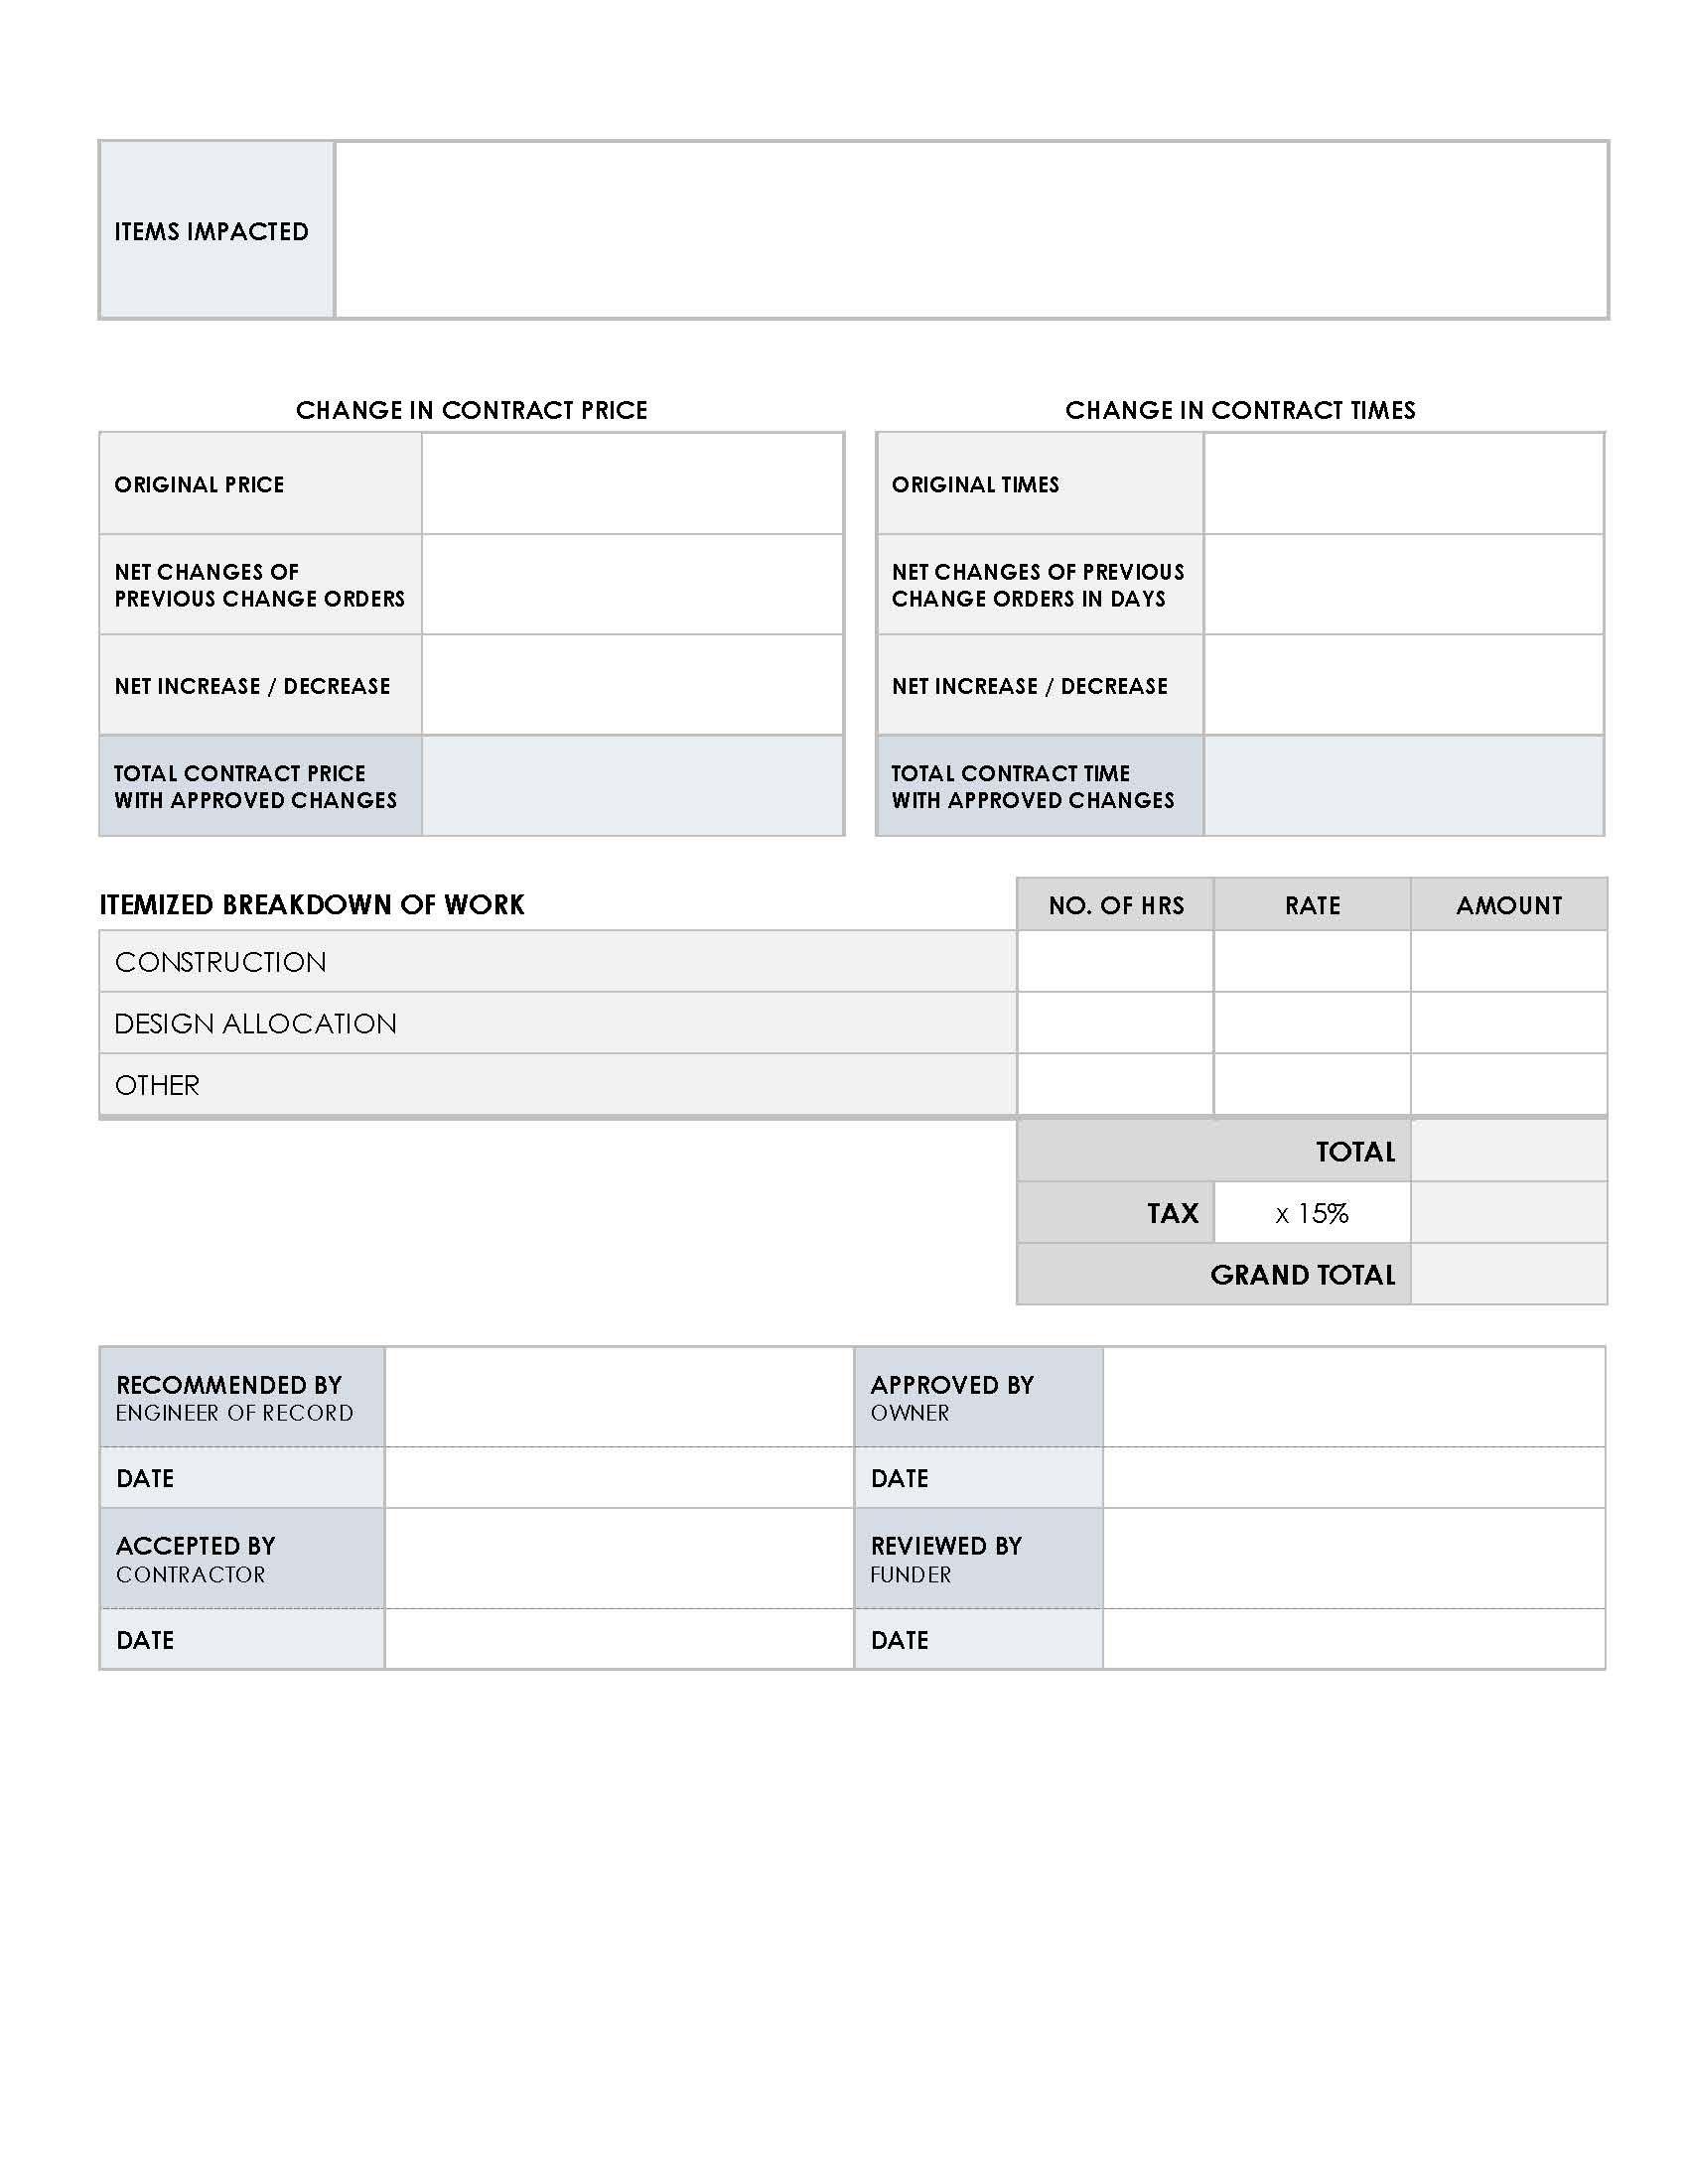 Engineering Change Order Template Free Download Project Management Templates Templates Templates Free Download